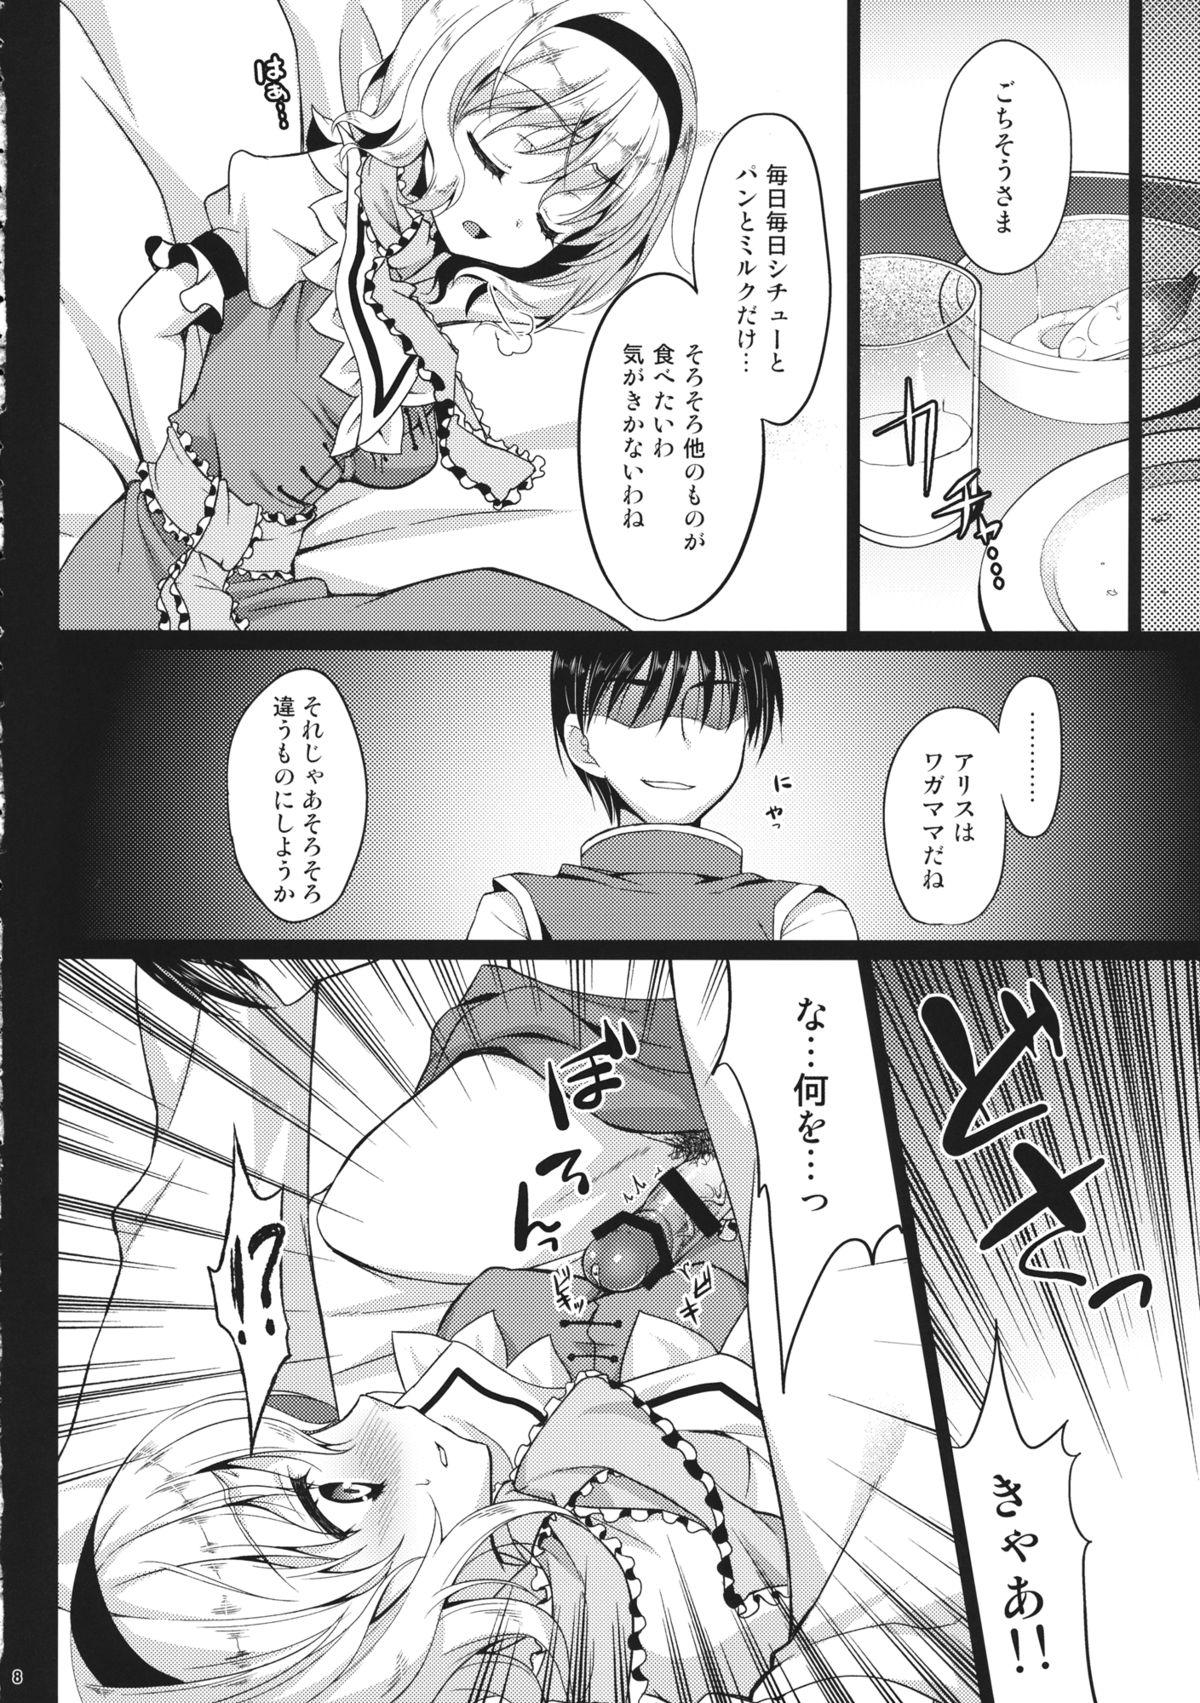 Ningyoutsukai no Utage Zen 6